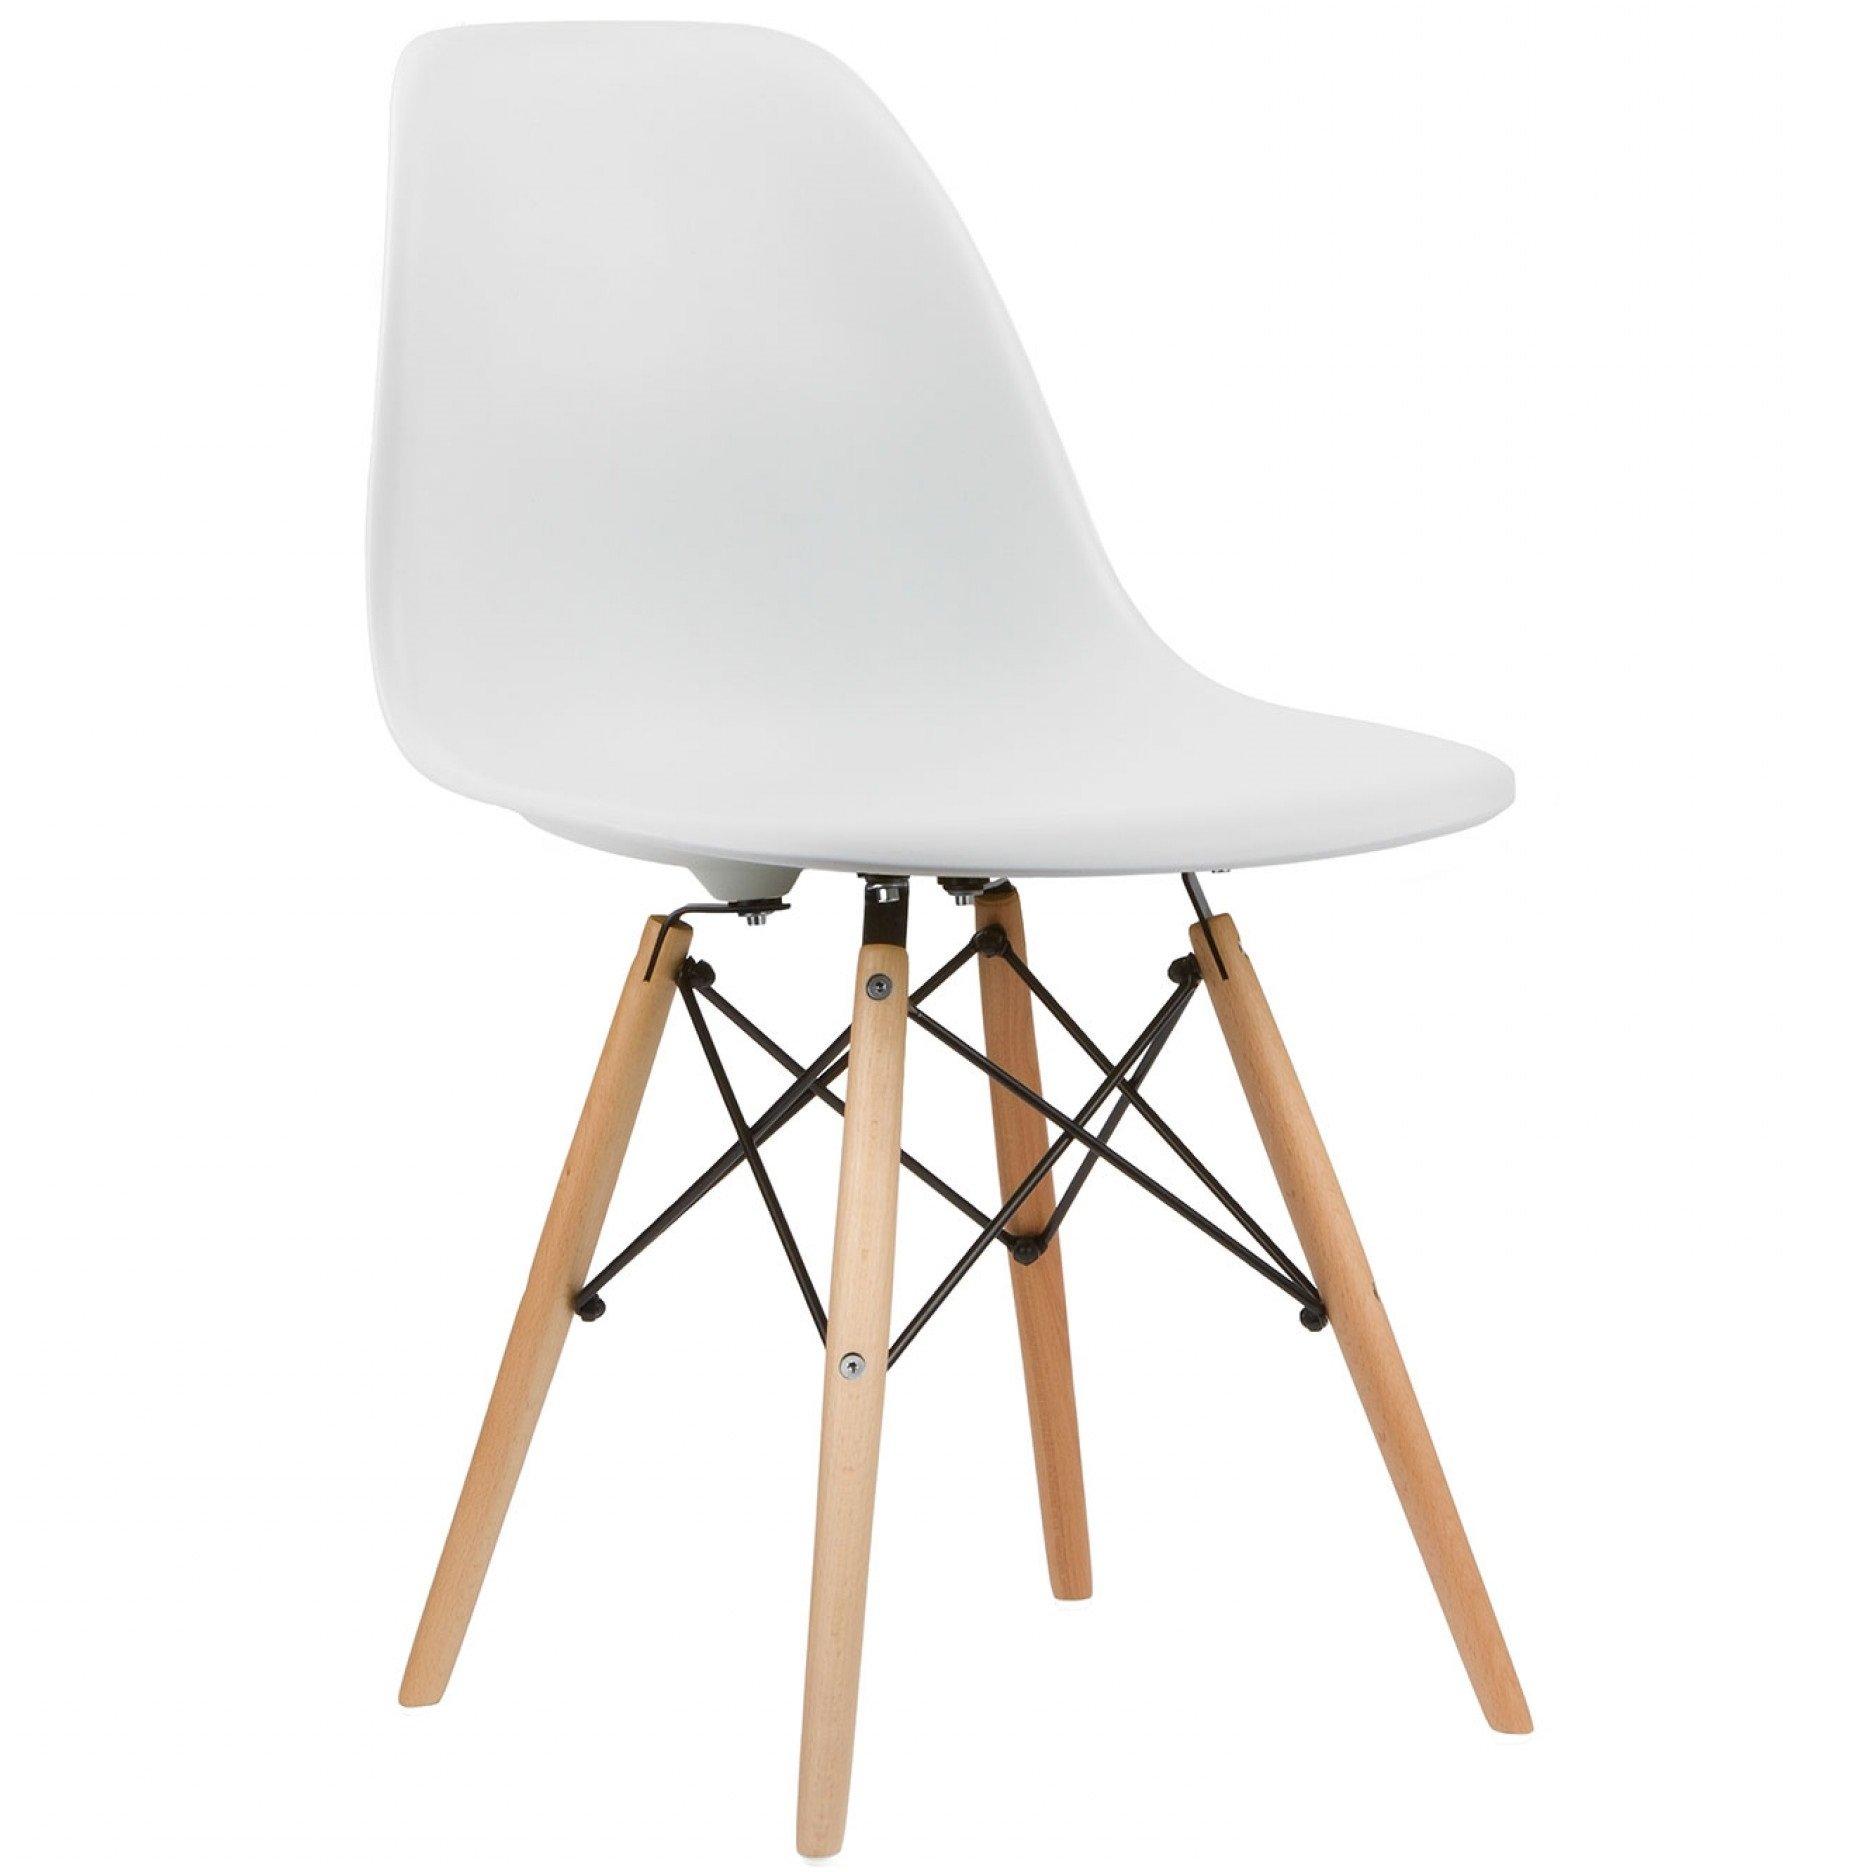 Weißer Stuhl: Amazon.de